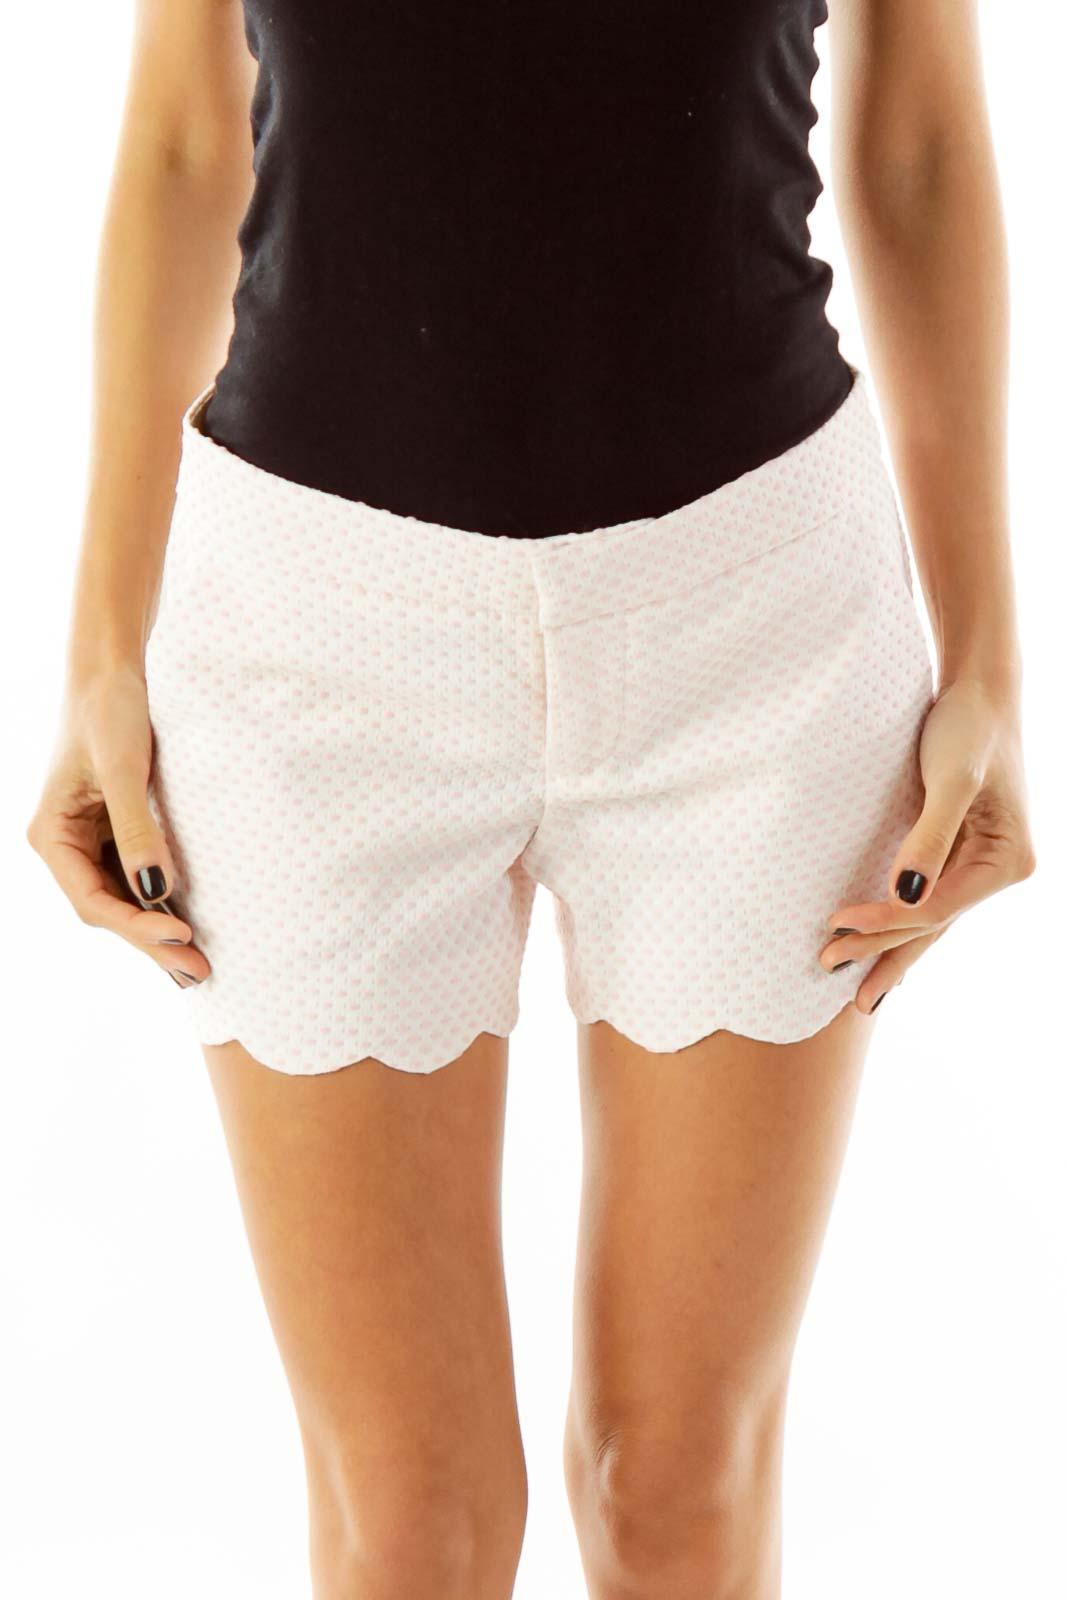 Pink & White Polka-Dot Shorts